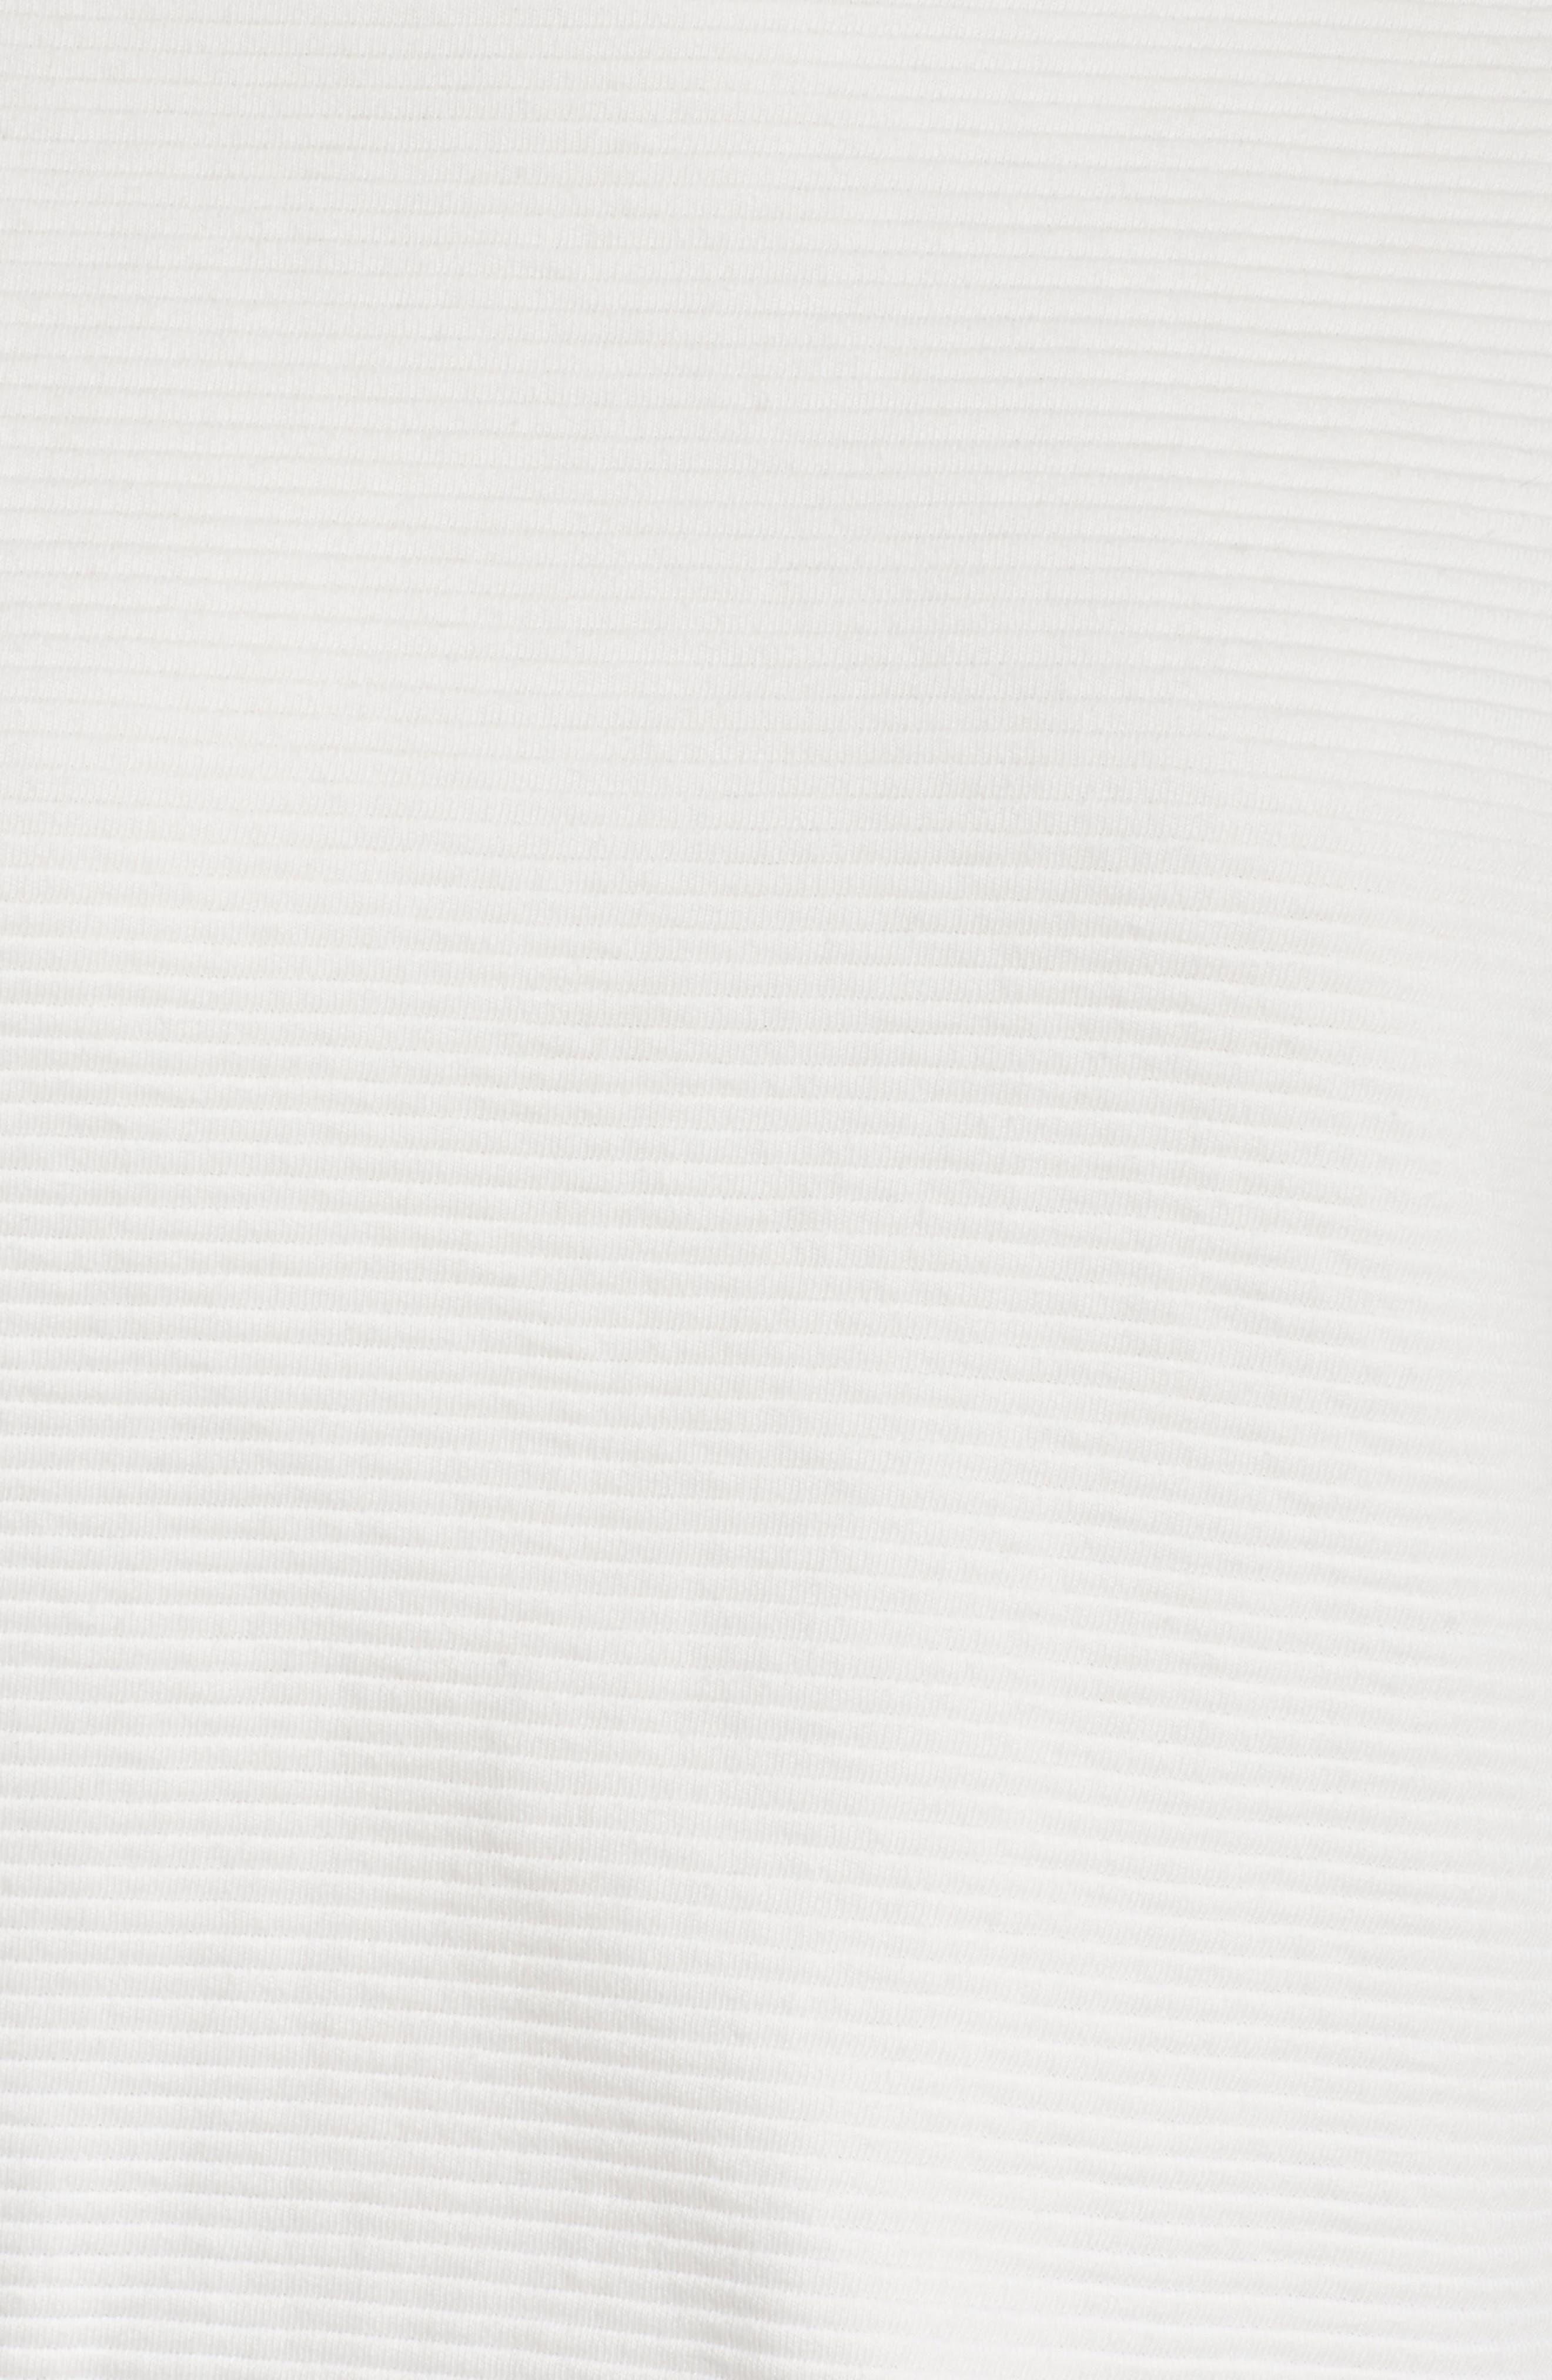 Whittier Sweatshirt,                             Alternate thumbnail 6, color,                             100